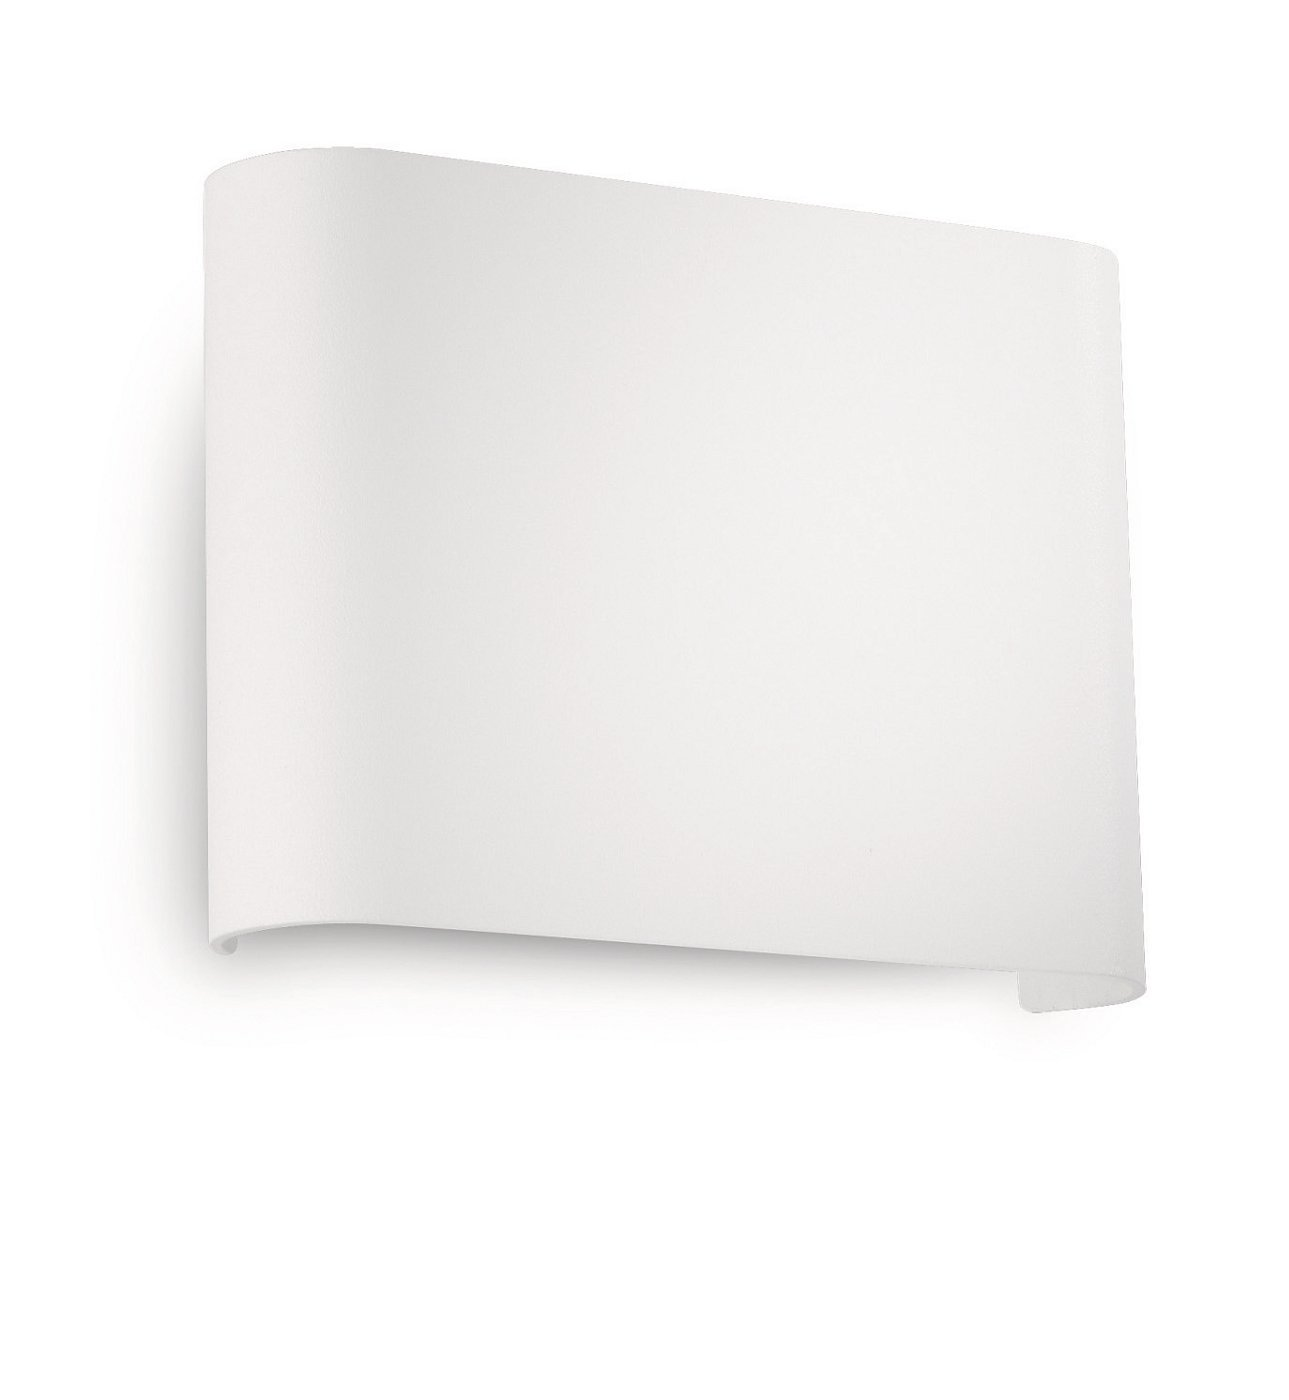 Philips 455913116 Eclairages mural Blanc M/étal